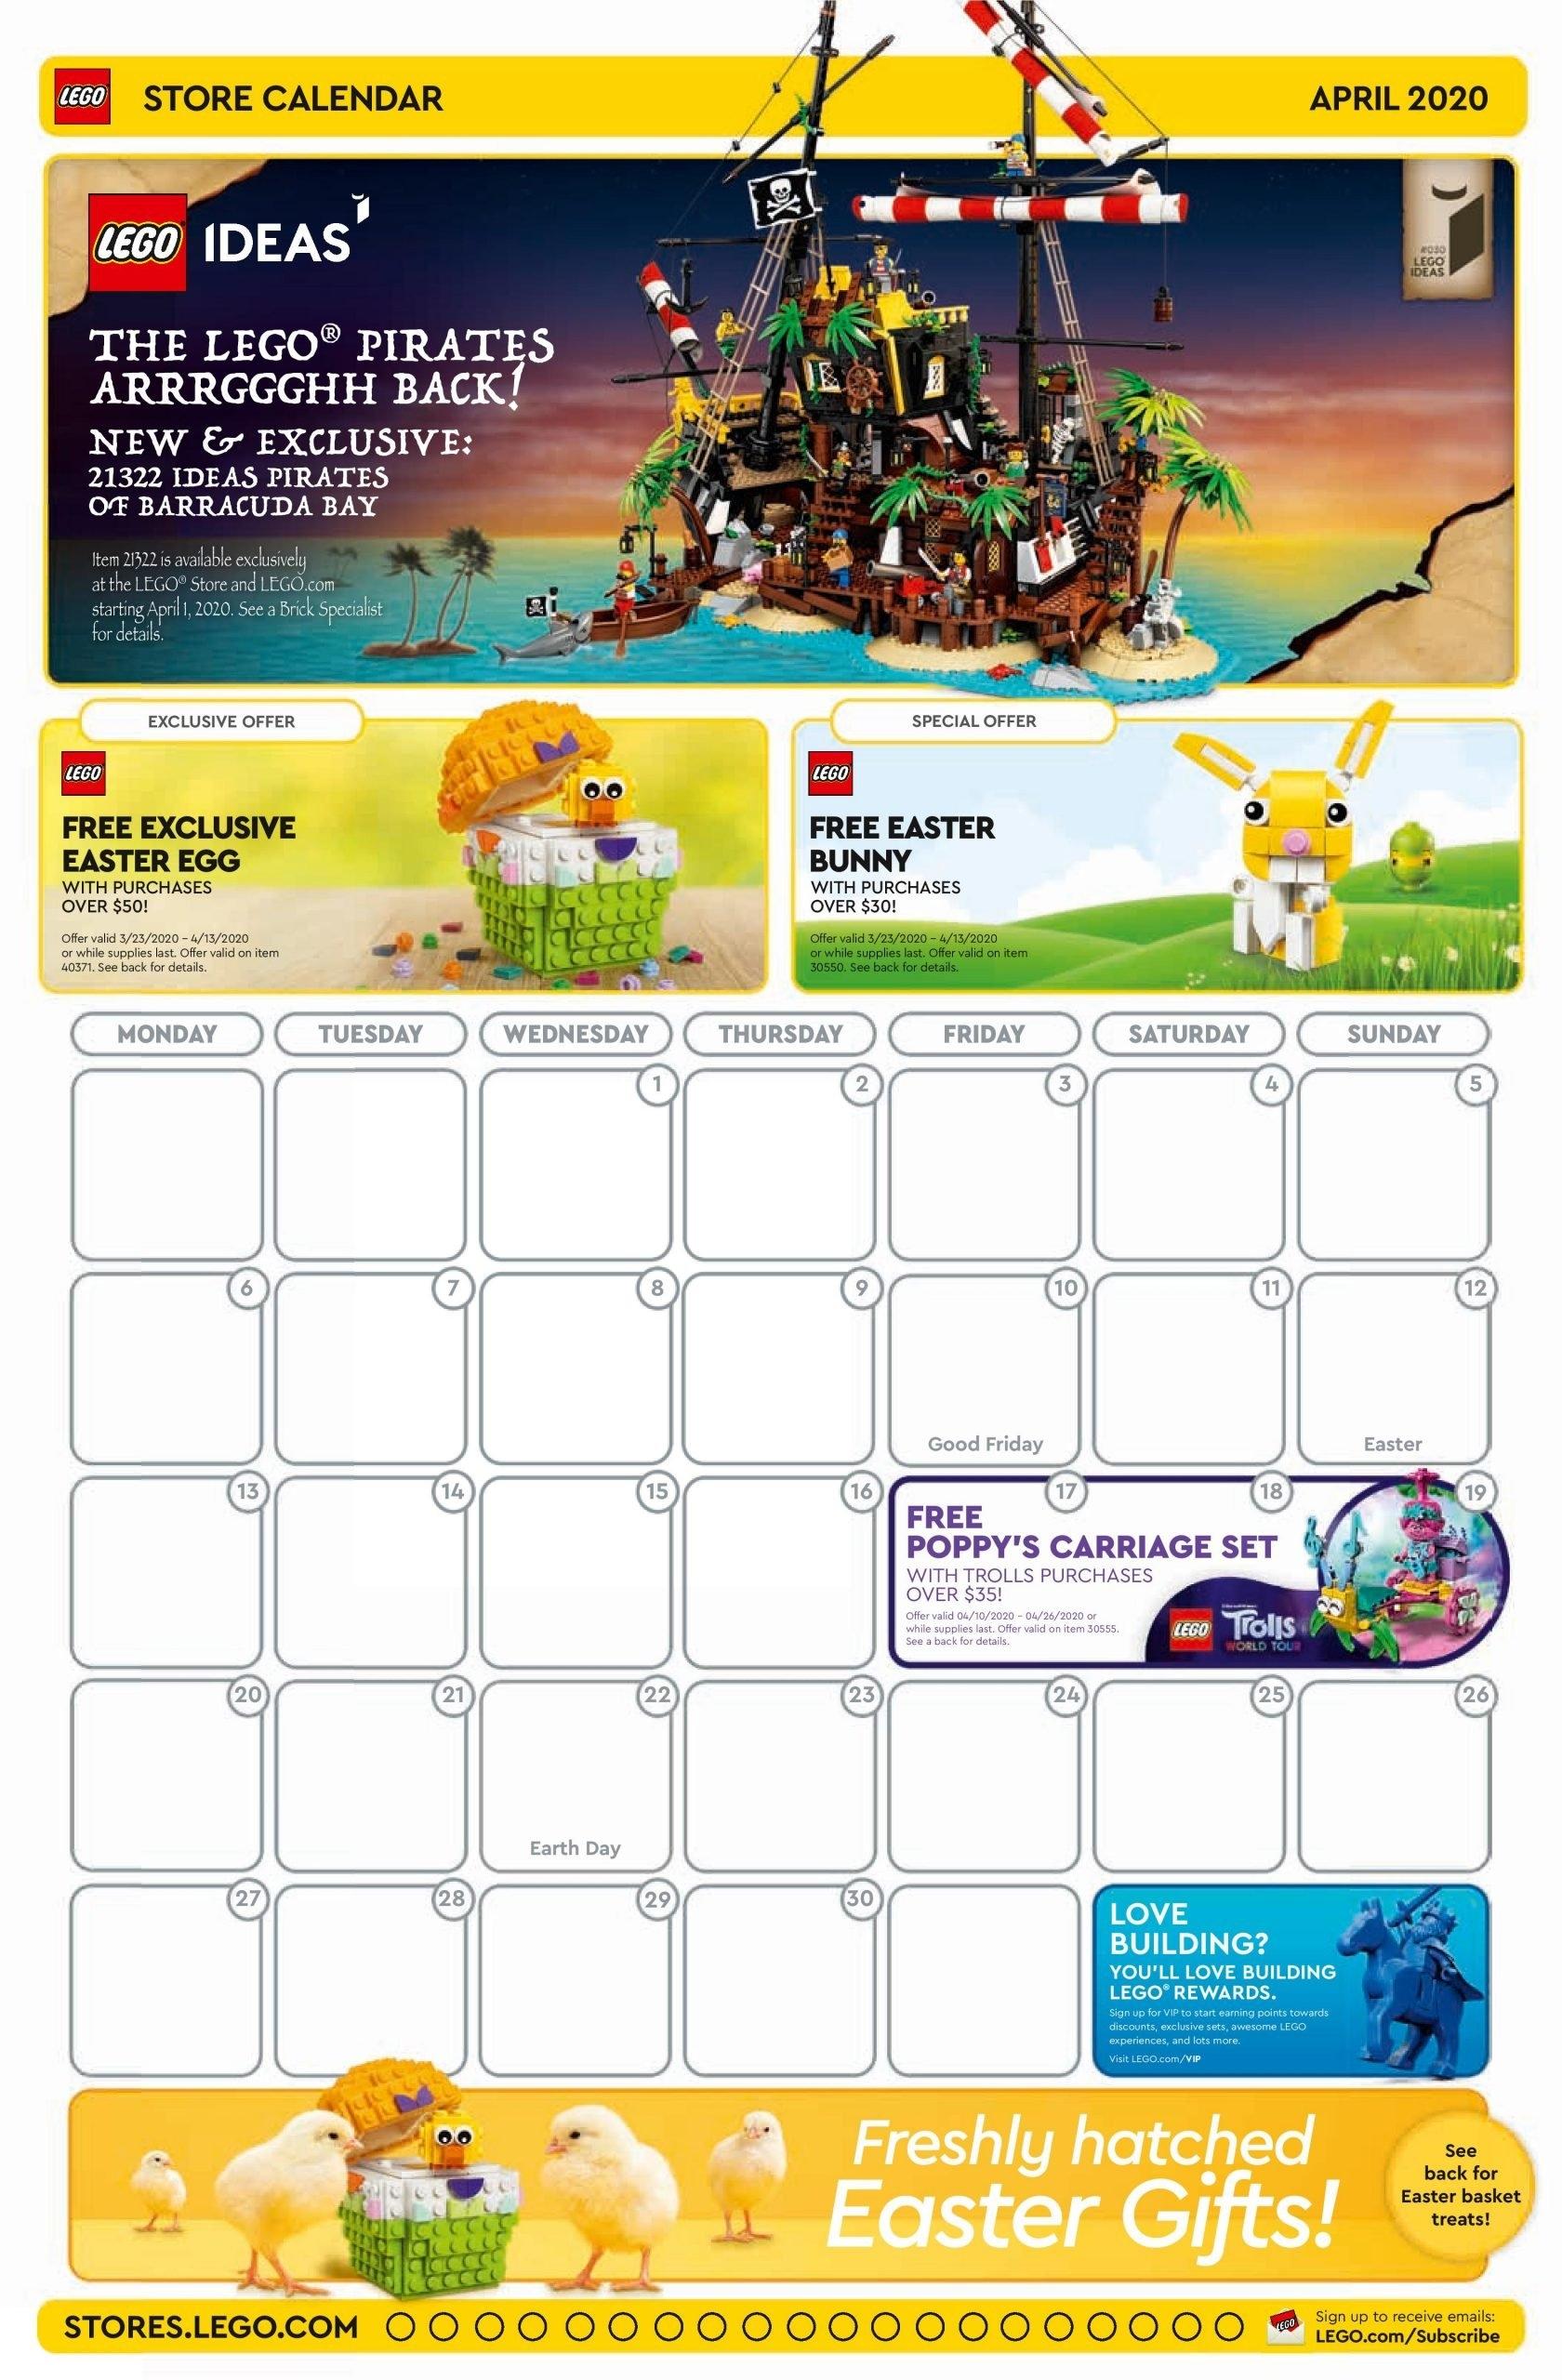 Lego Calendar April 2021 | Calendar 2021 intended for 2021 Media Broadcast Calendar Printable Photo